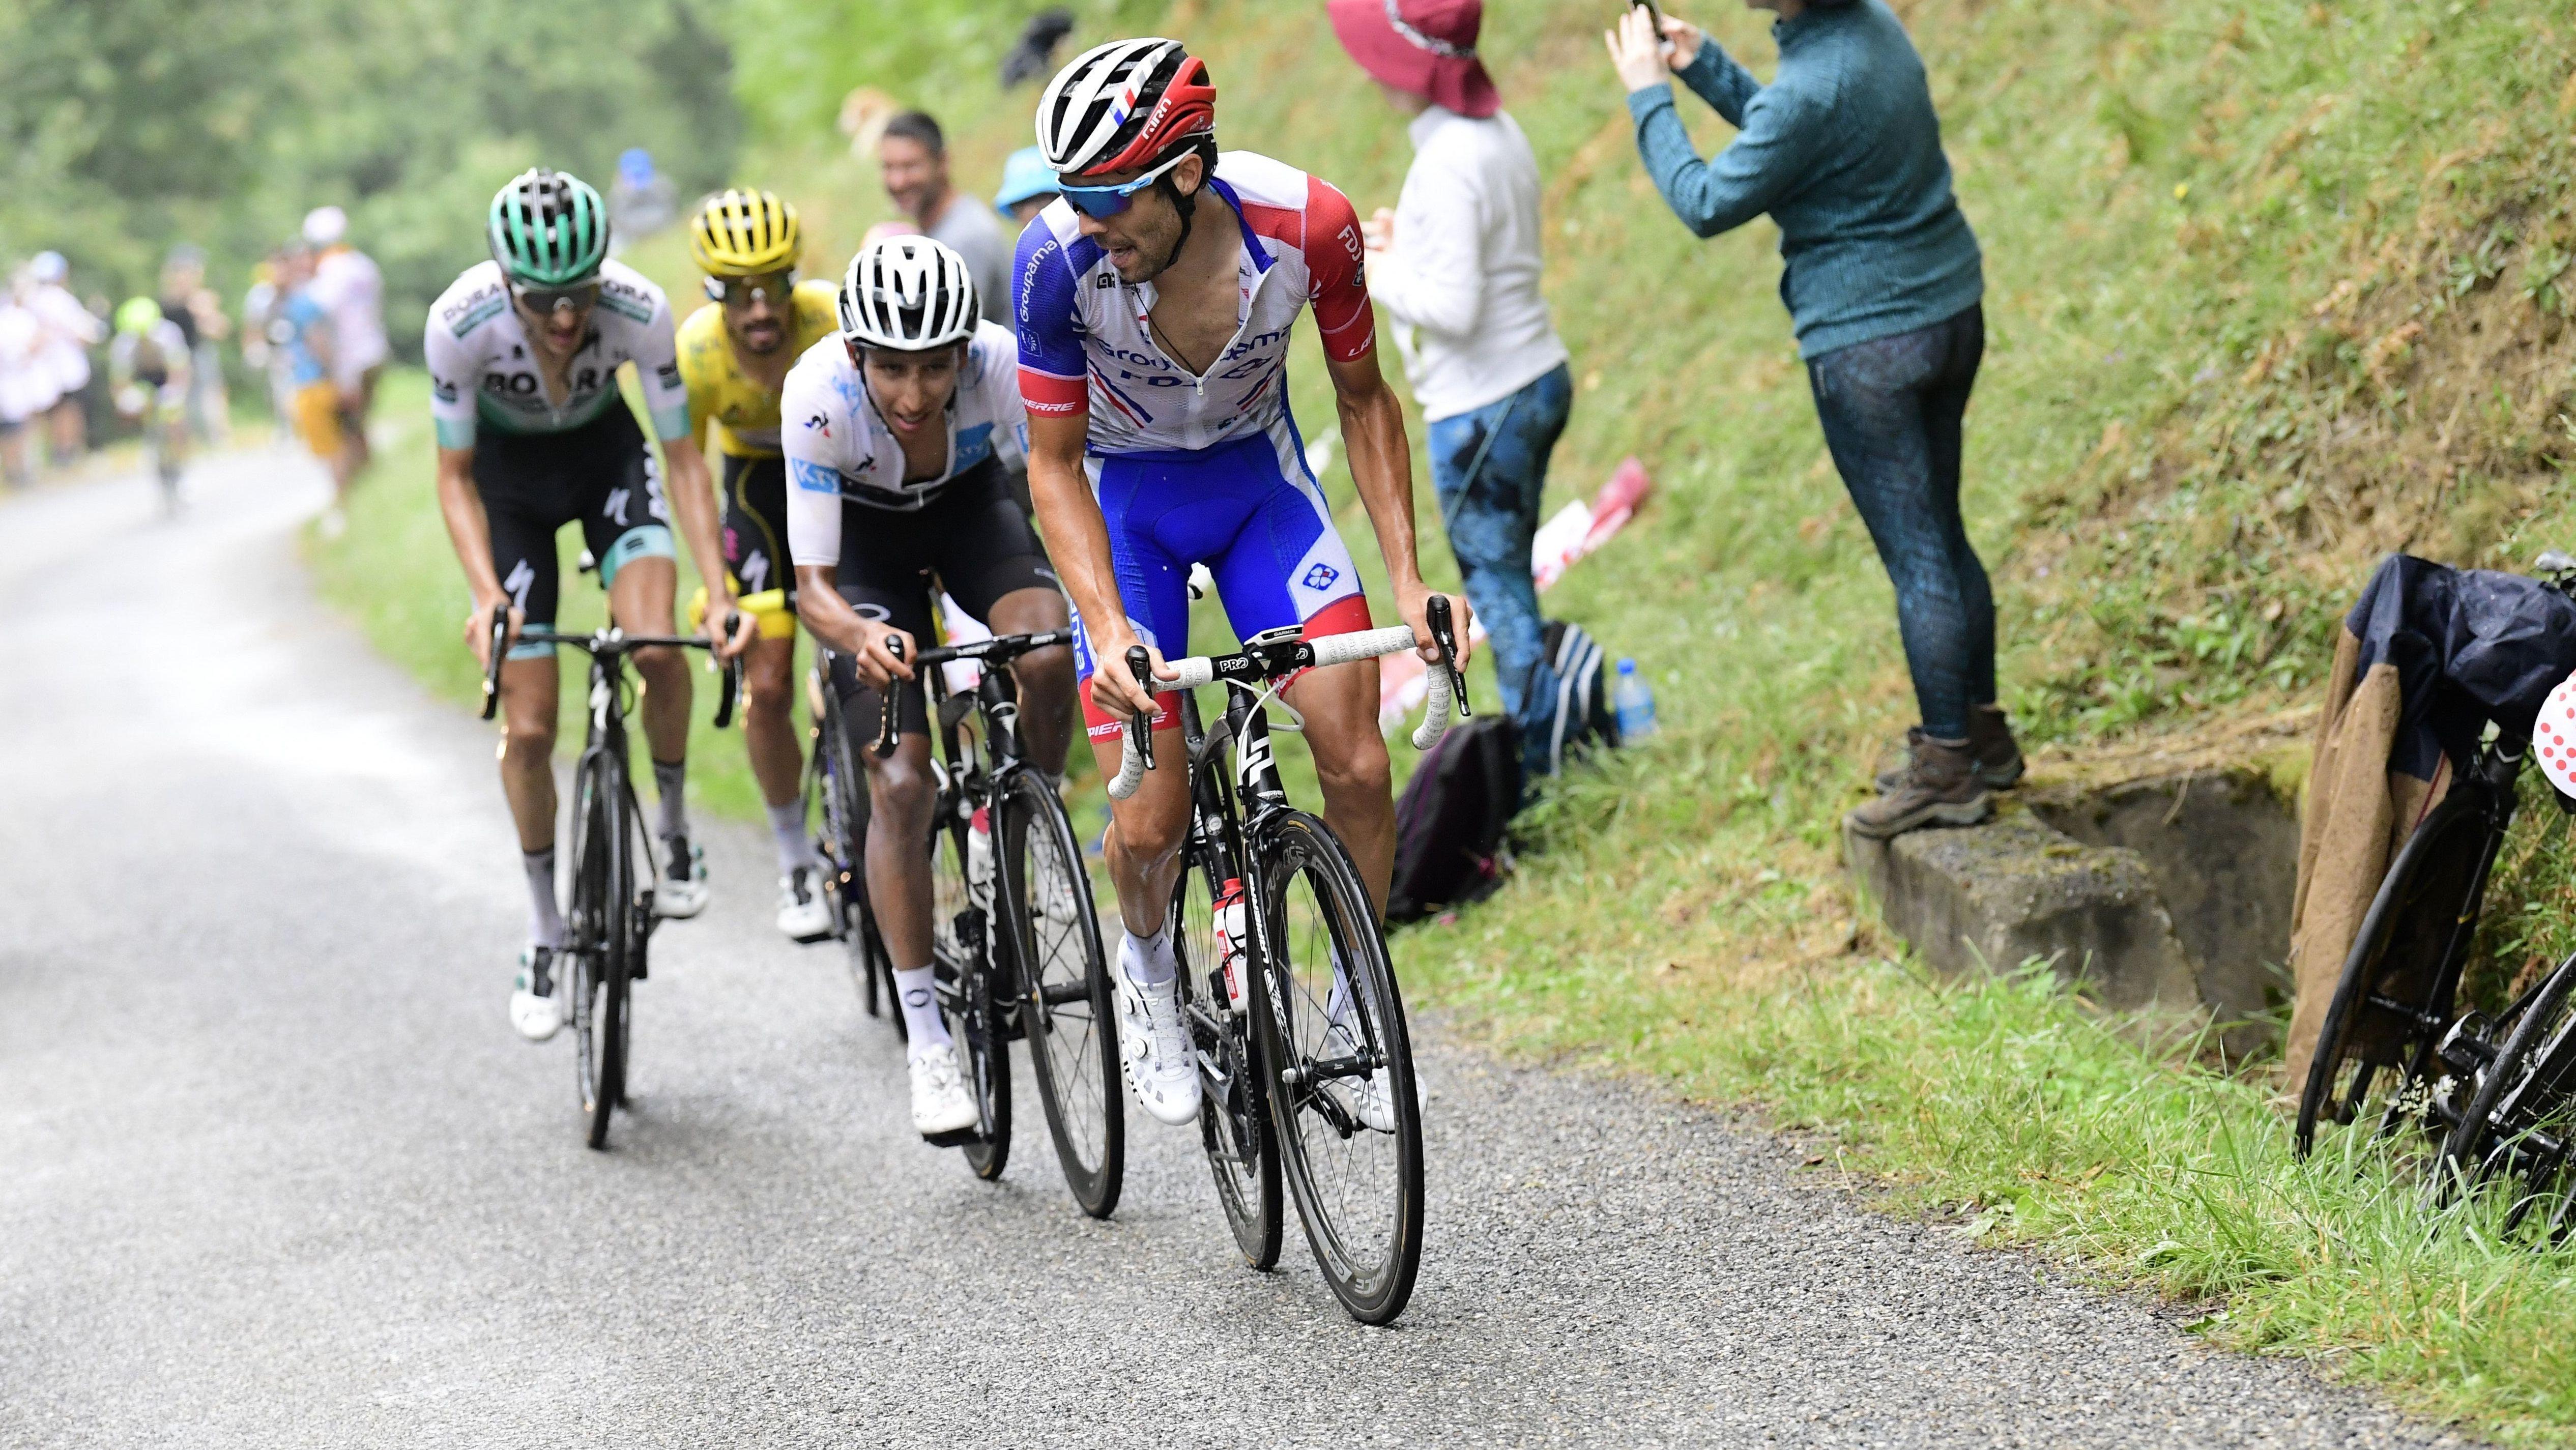 Radprofis bei der Tour de France 2019